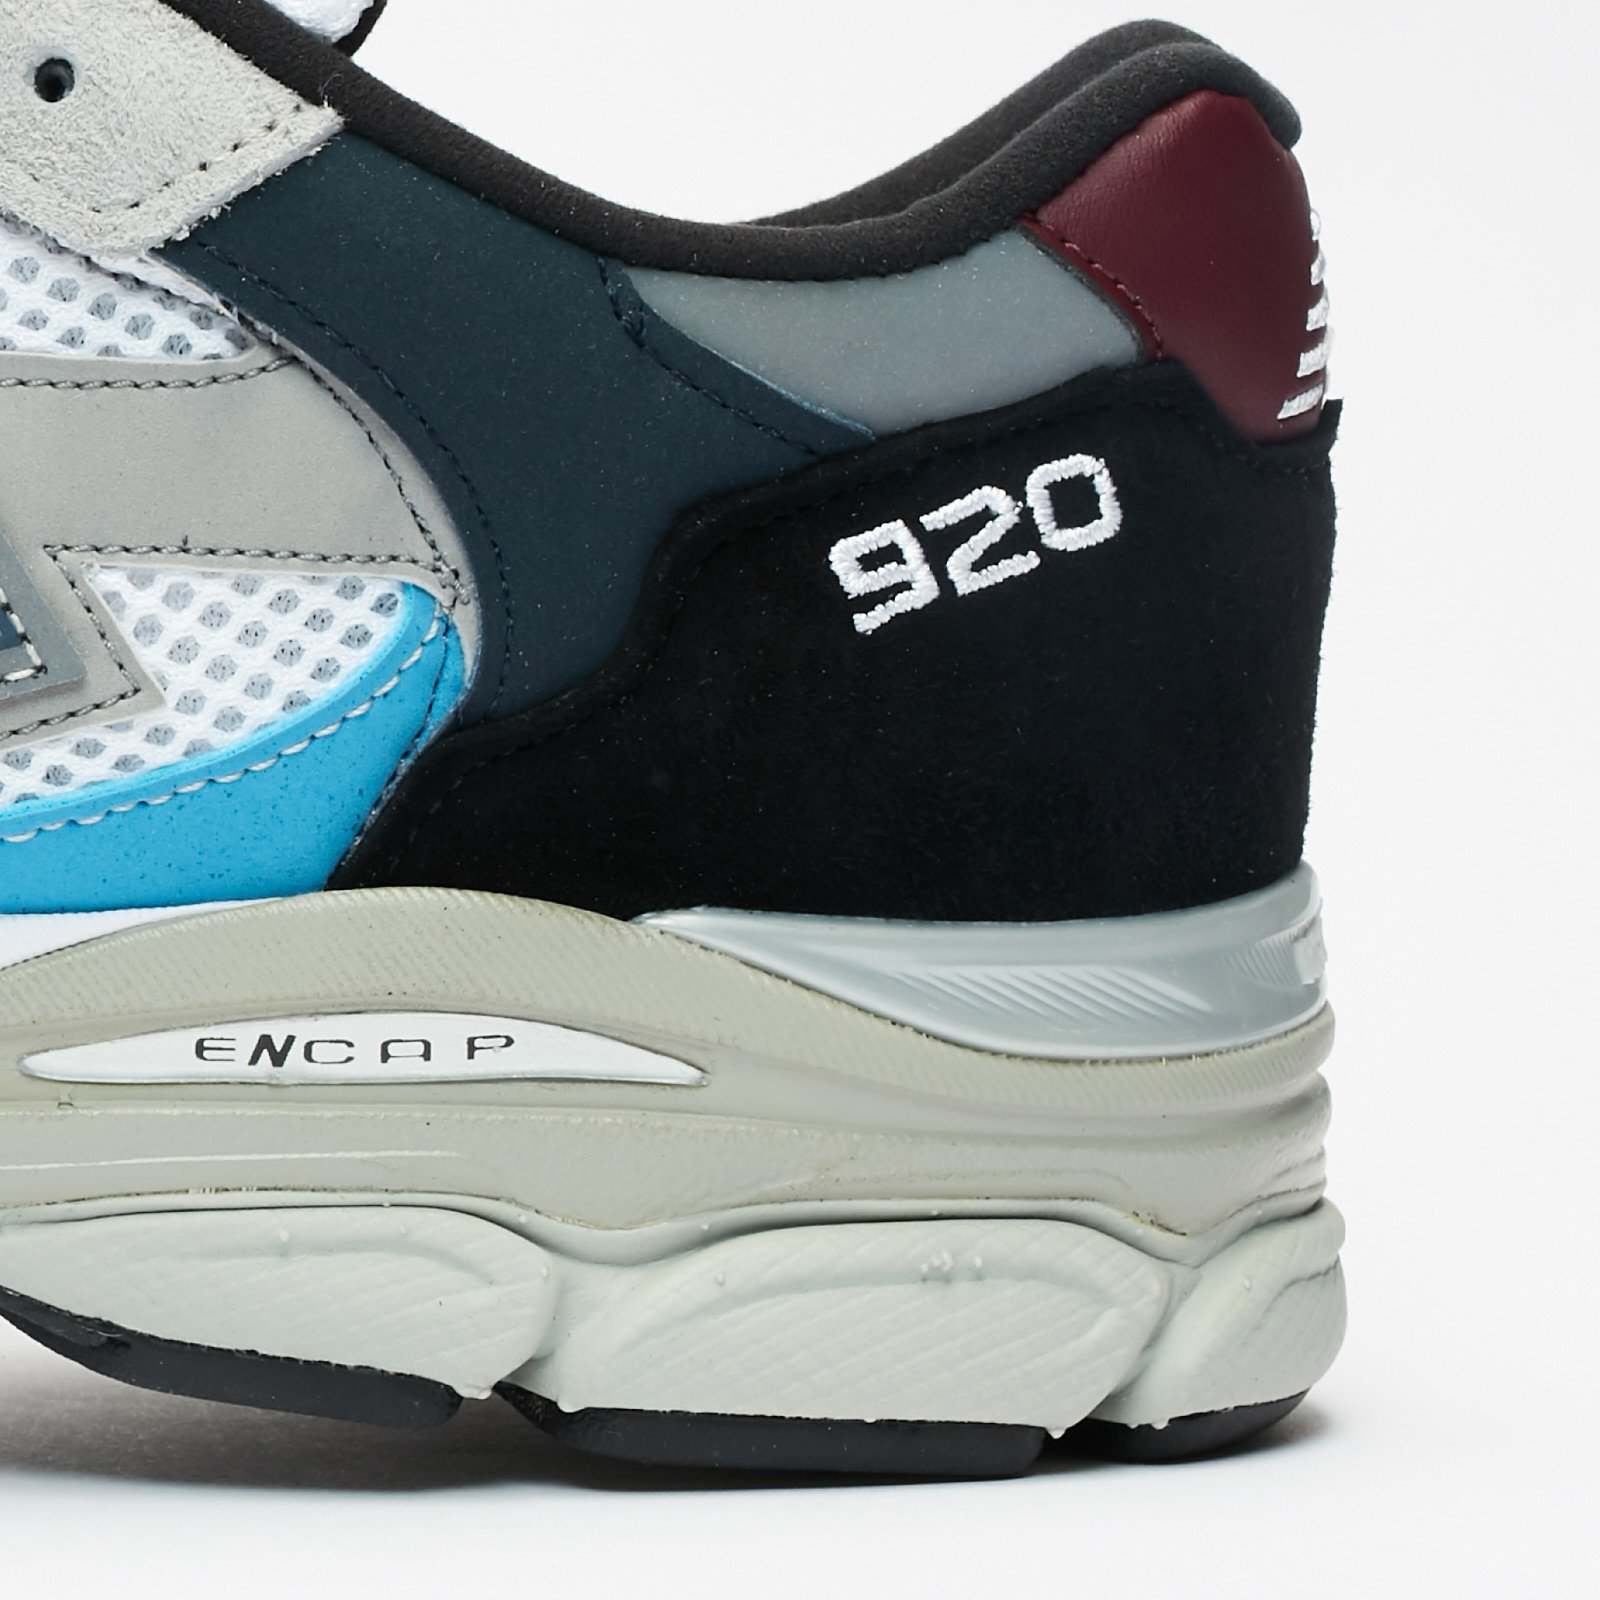 New Balance M920 - M920nbr